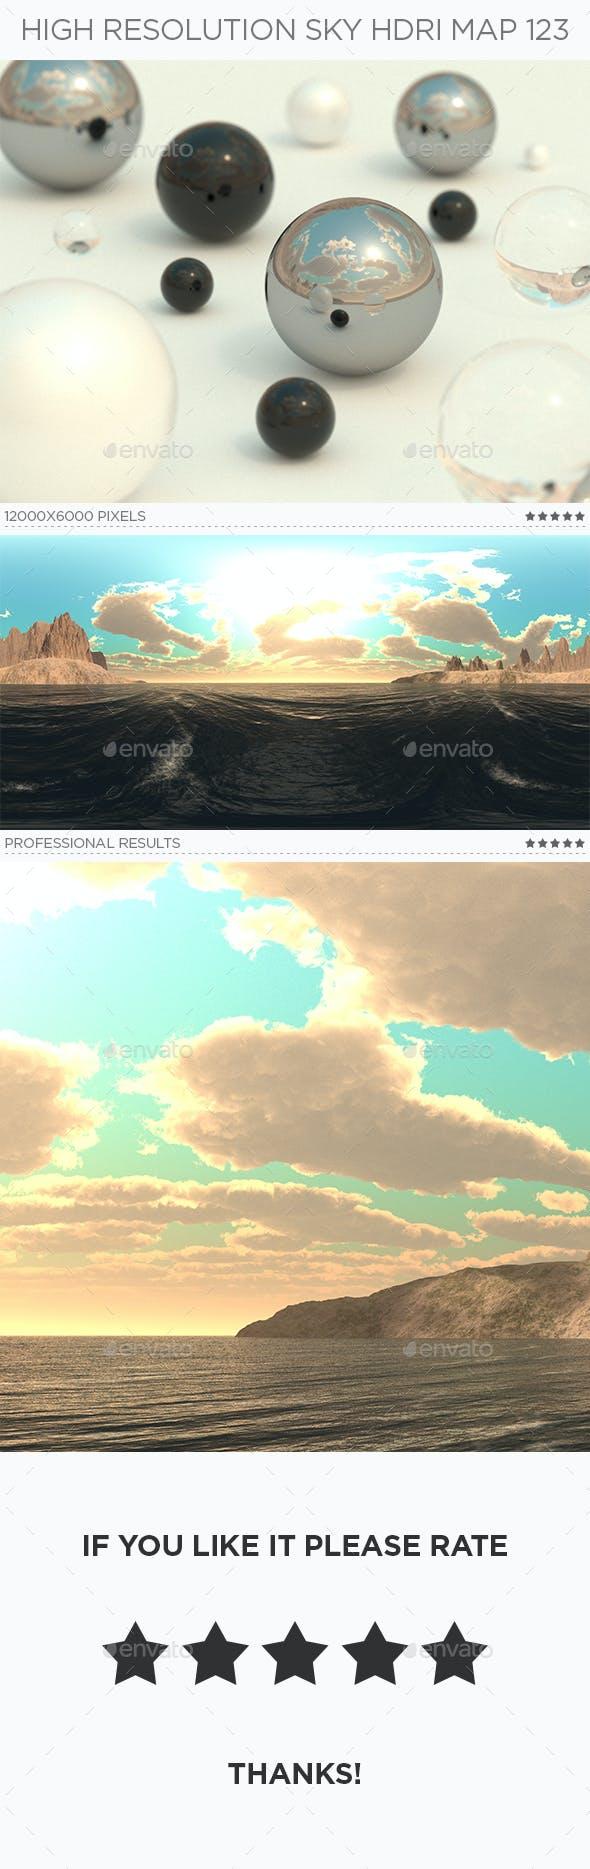 High Resolution Sky HDRi Map 123 - 3DOcean Item for Sale